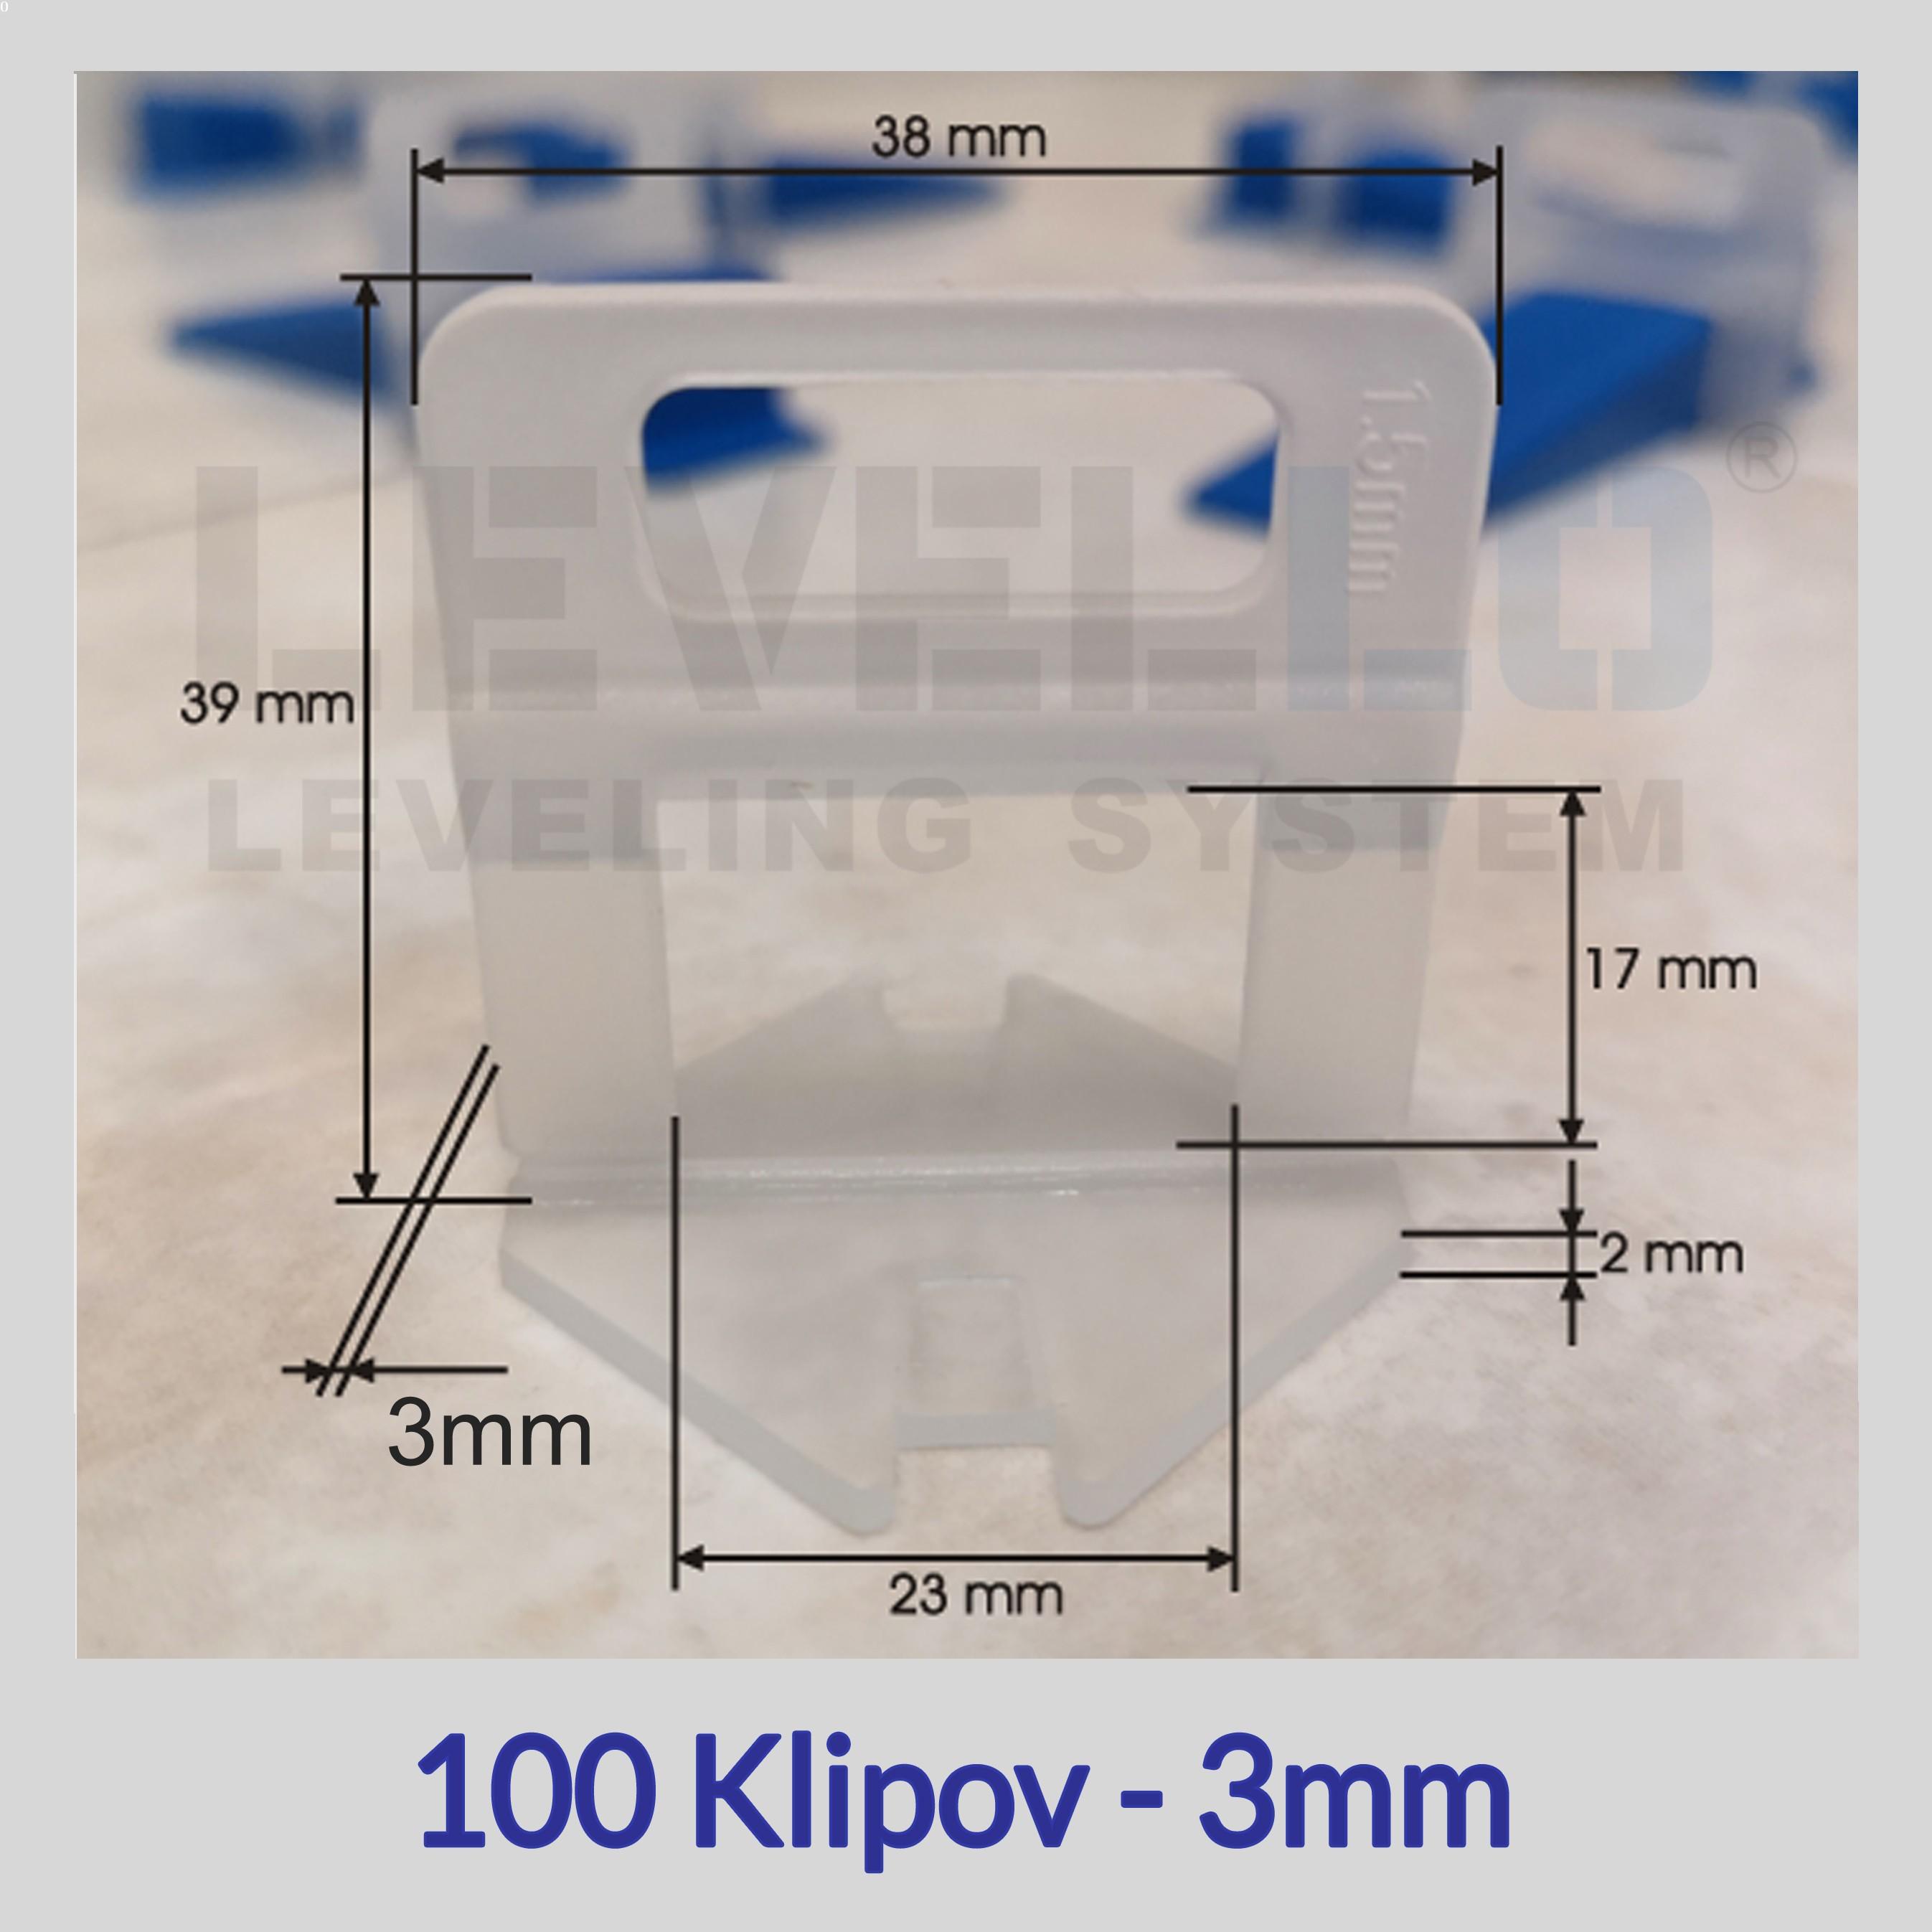 Klipy Eko LEVELLO ® 3 mm, 100 kusov